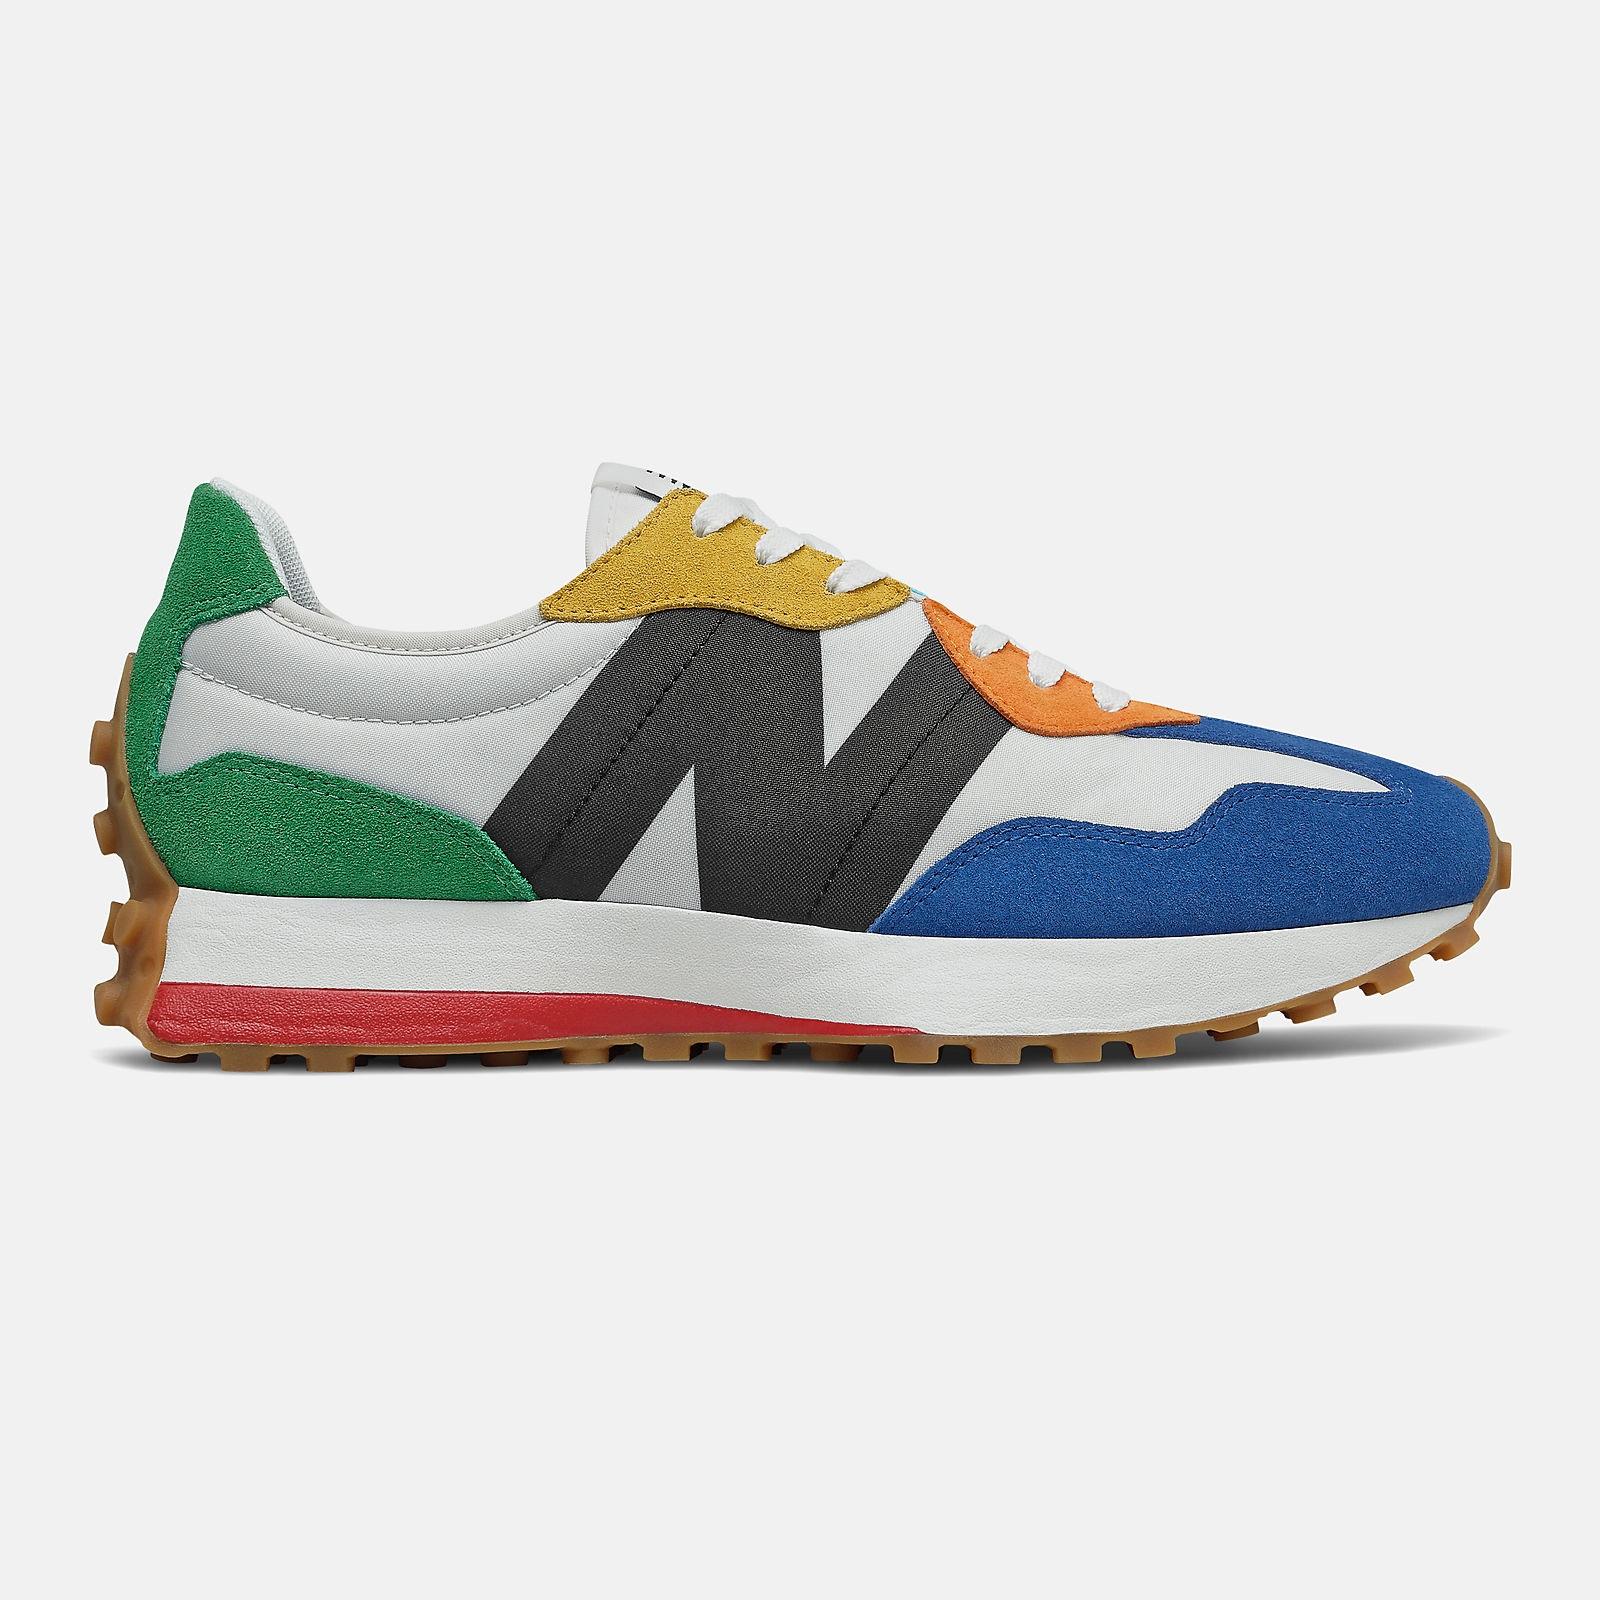 New Balance 327 'Multicolor'